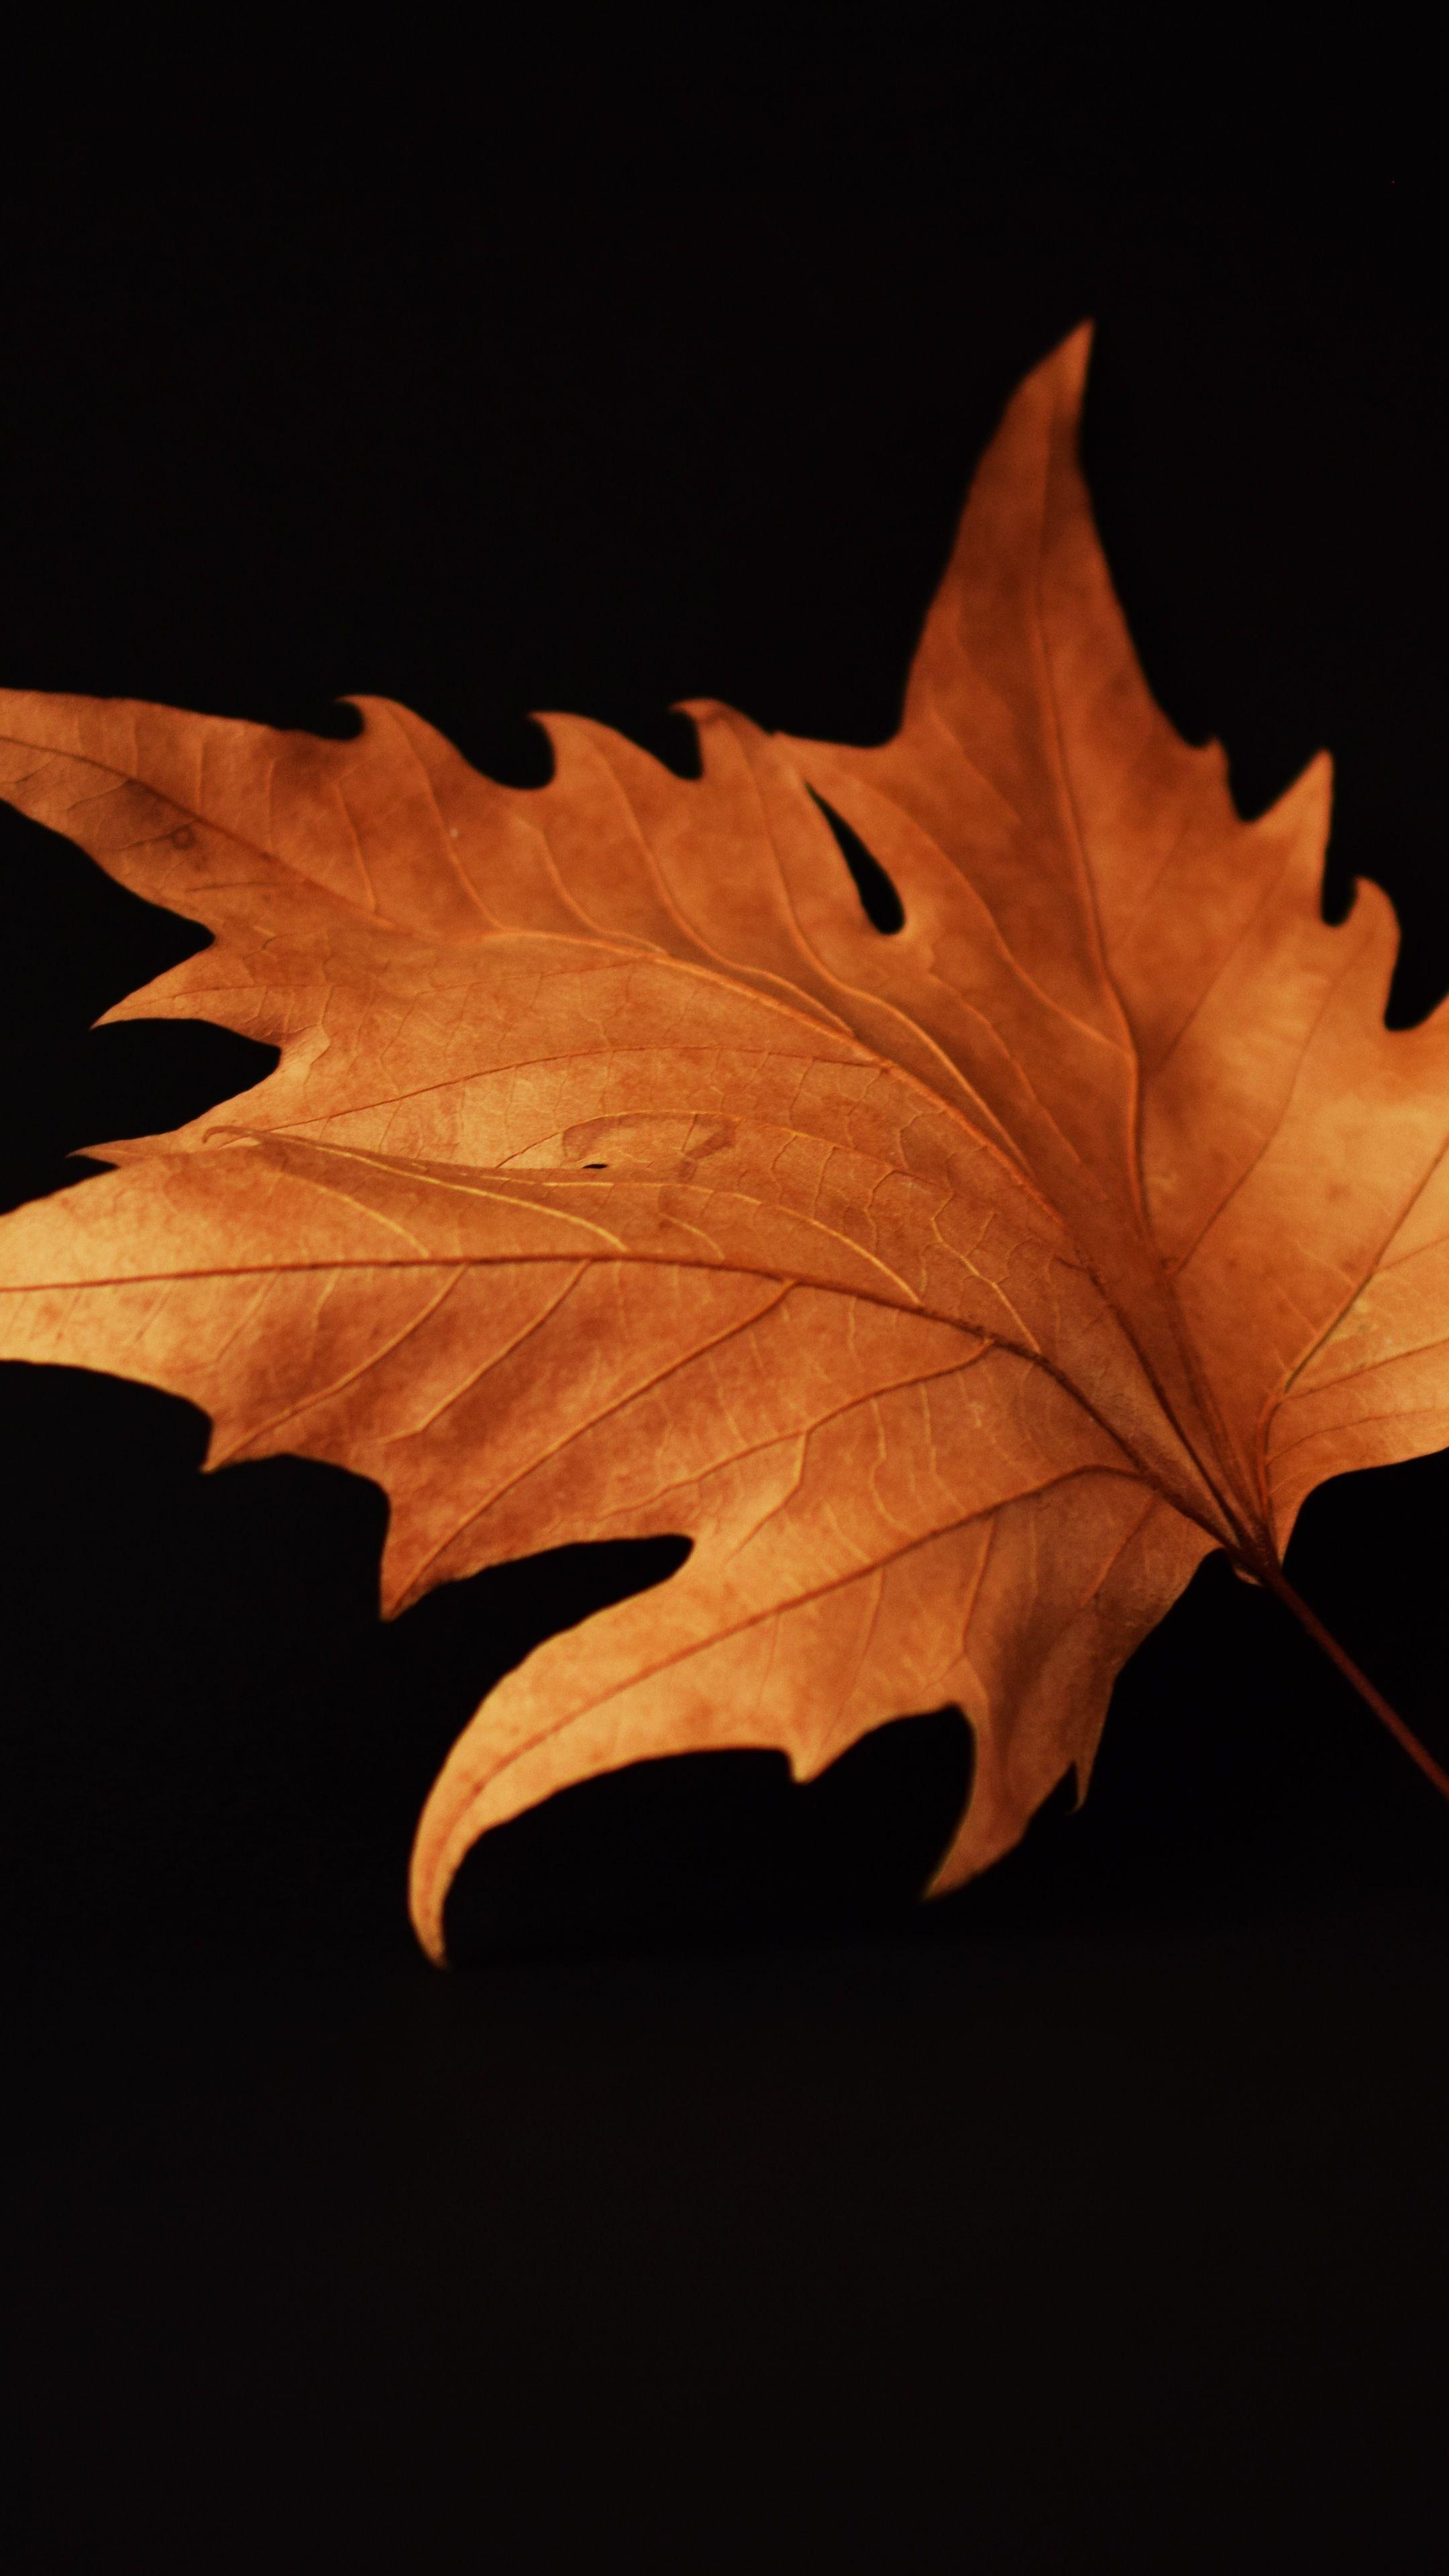 Nature Autumn Leaf Black Background Wallpapers Fall Wallpaper Autumn Leaves Wallpaper Black Background Wallpaper